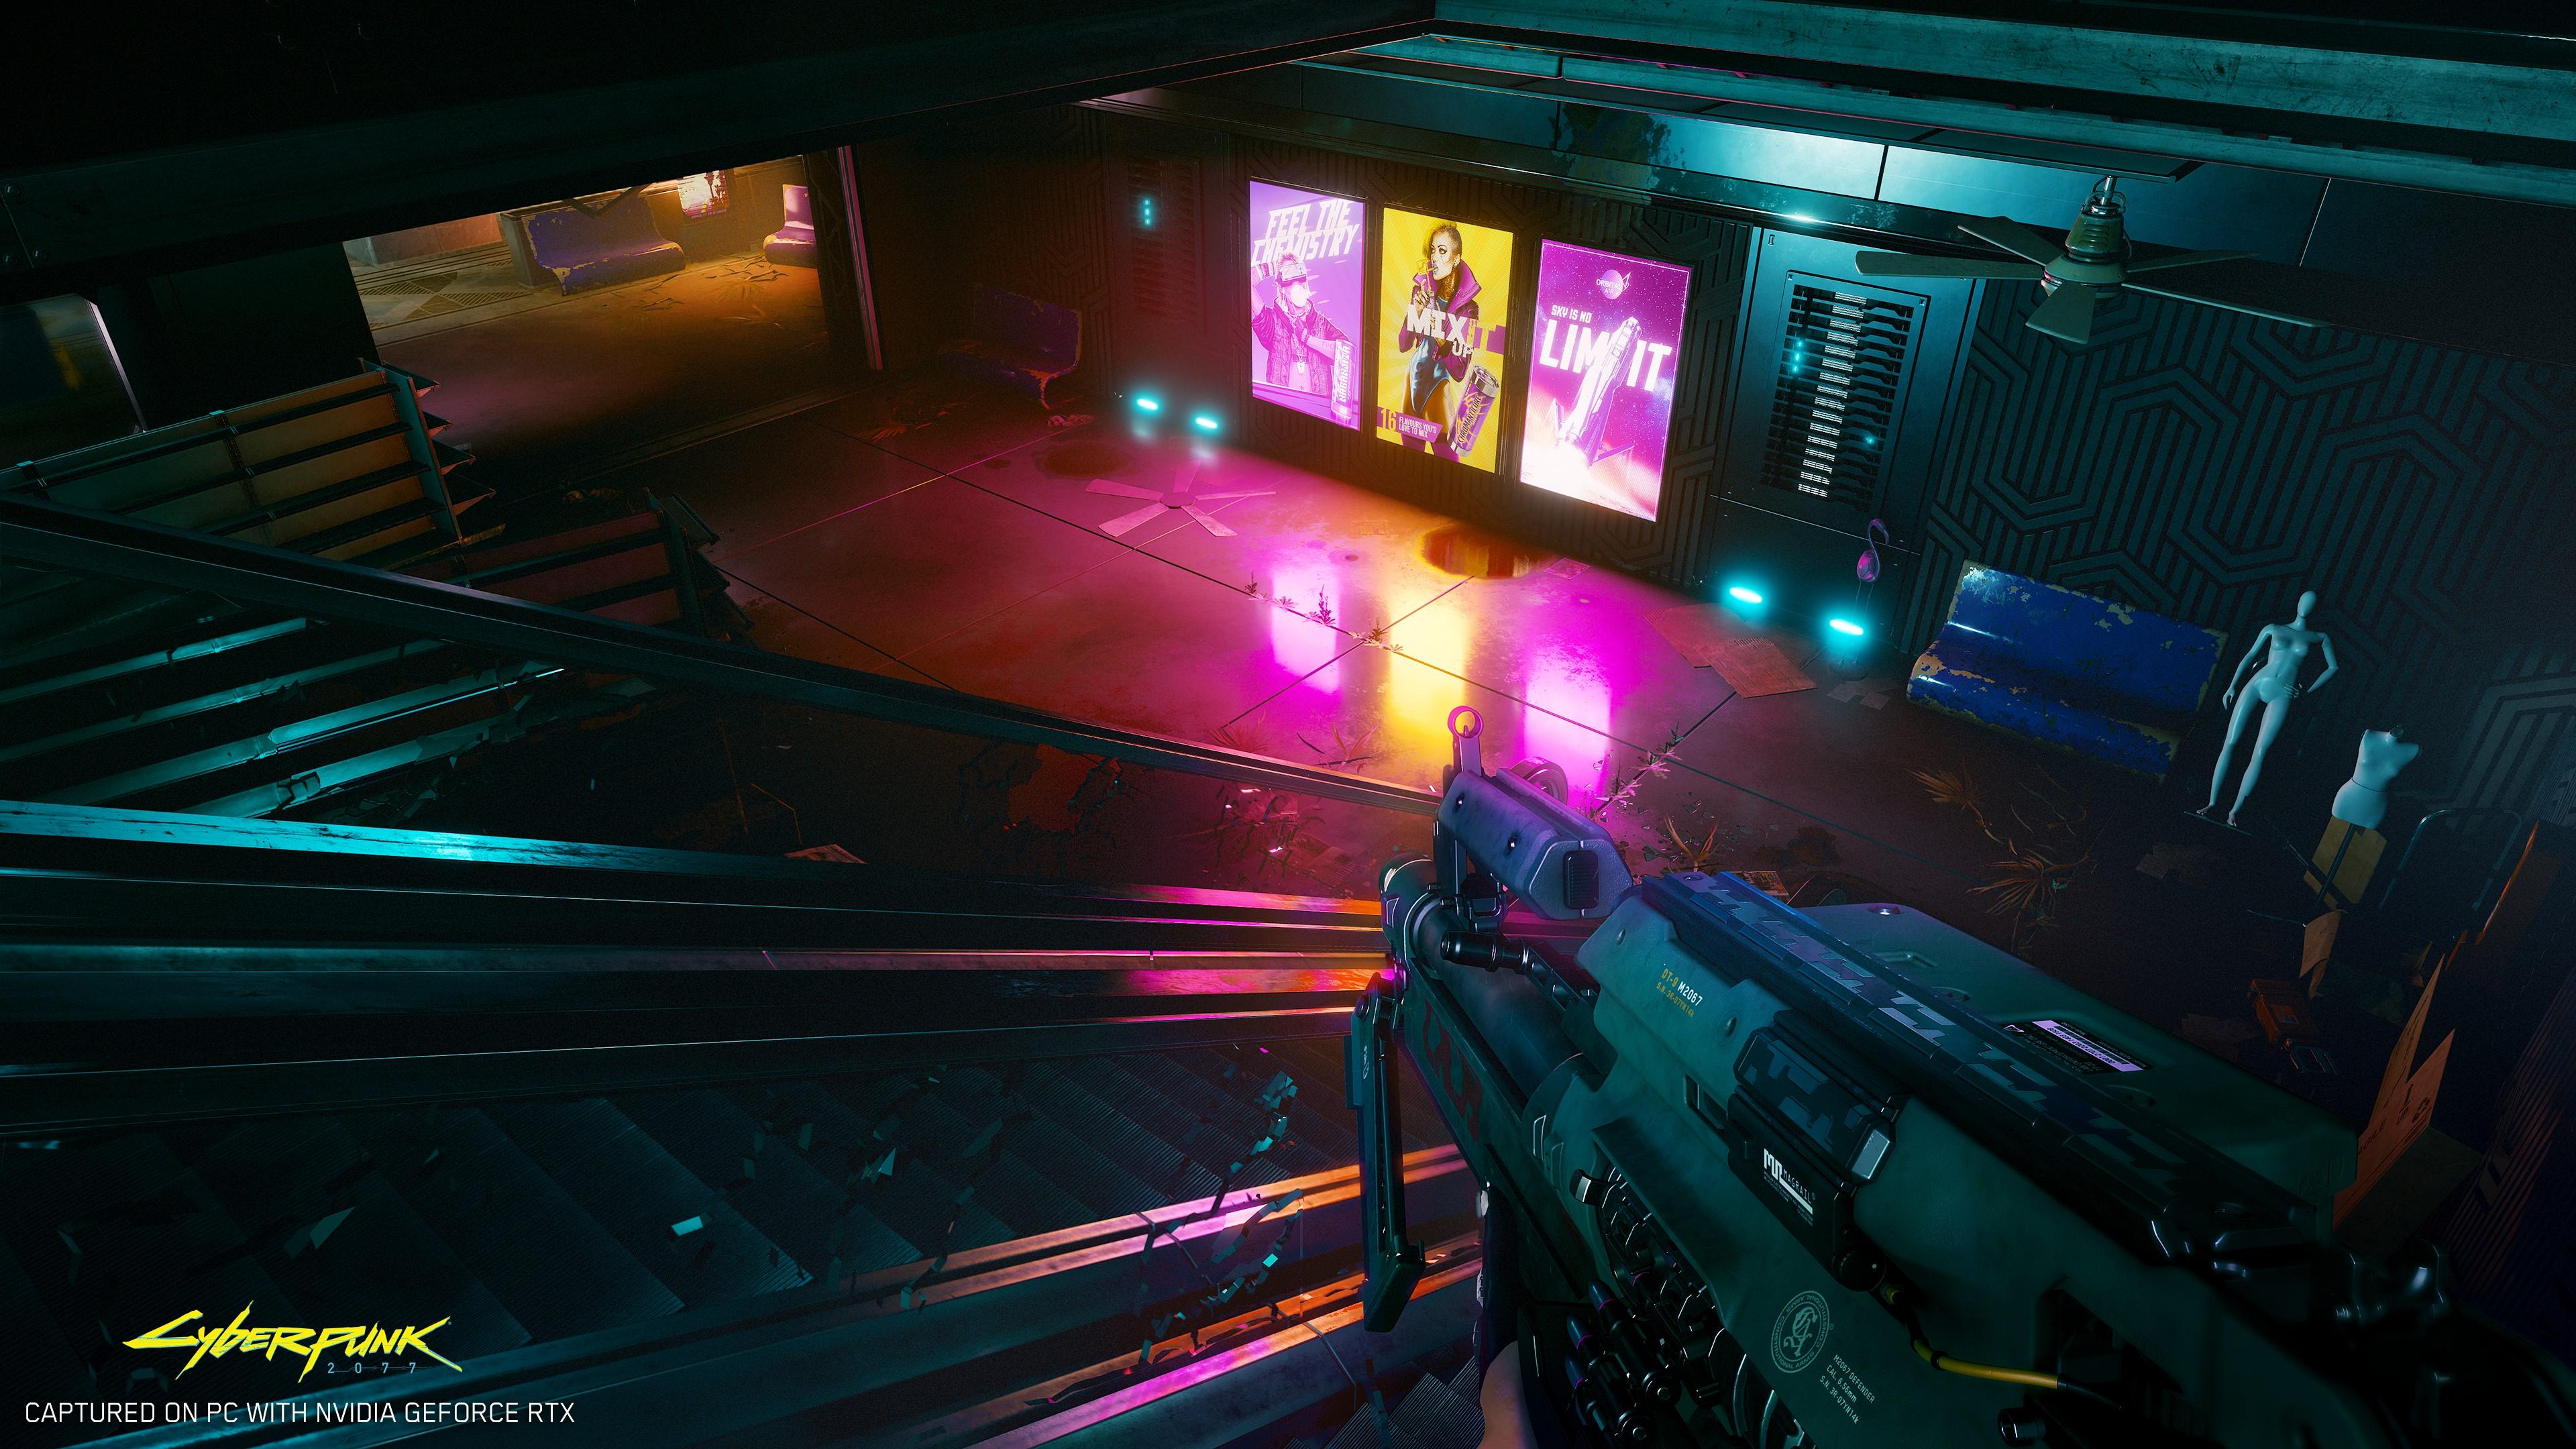 cyberpunk 2077 abandoned mall NVIDIA และ CD PROJEKT RED ประกาศอย่างเป็นทางการให้การ์ดจอ NVIDIA GeForce RTX ซัพพอตพาทเนอร์เกมส์ Cyberpunk 2077 ด้วยเทคโนโลยี Ray Tracing